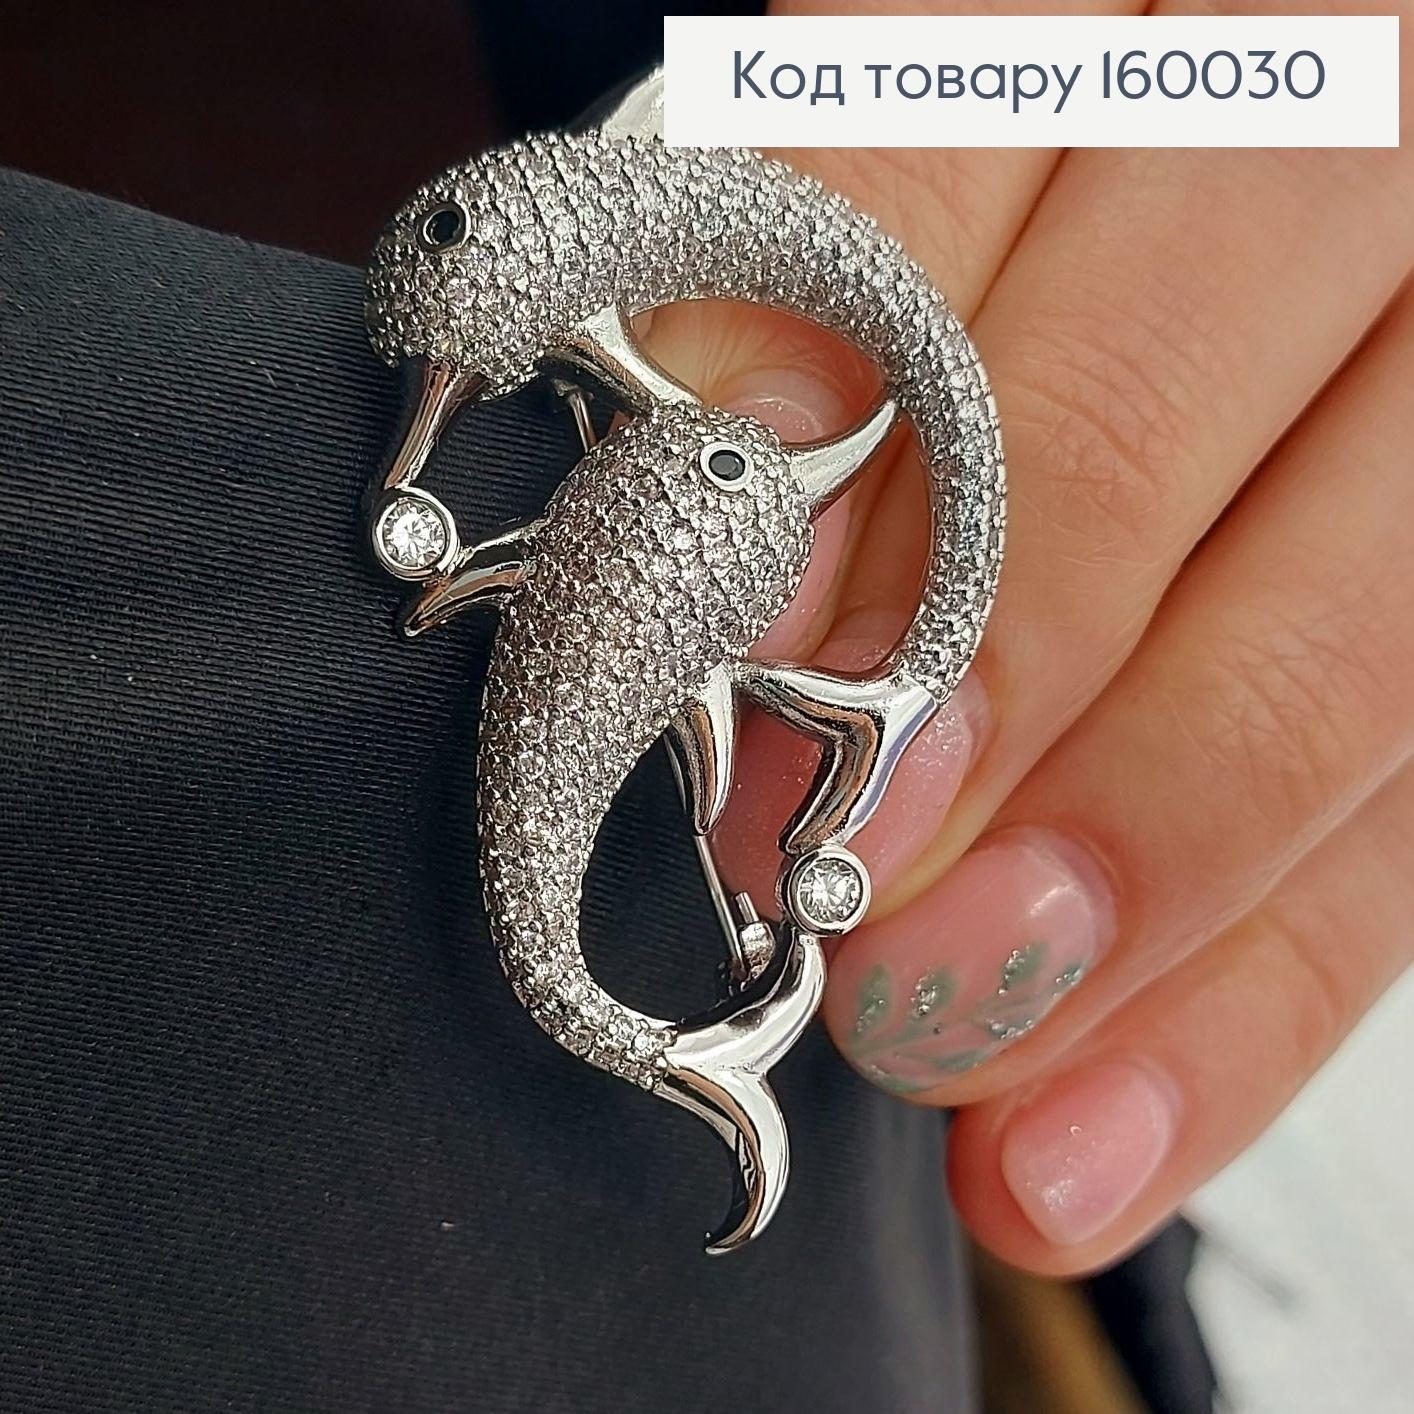 Брошка Дельфіни   в камінцях медичне золото  Xuping 18к 160030 фото 4